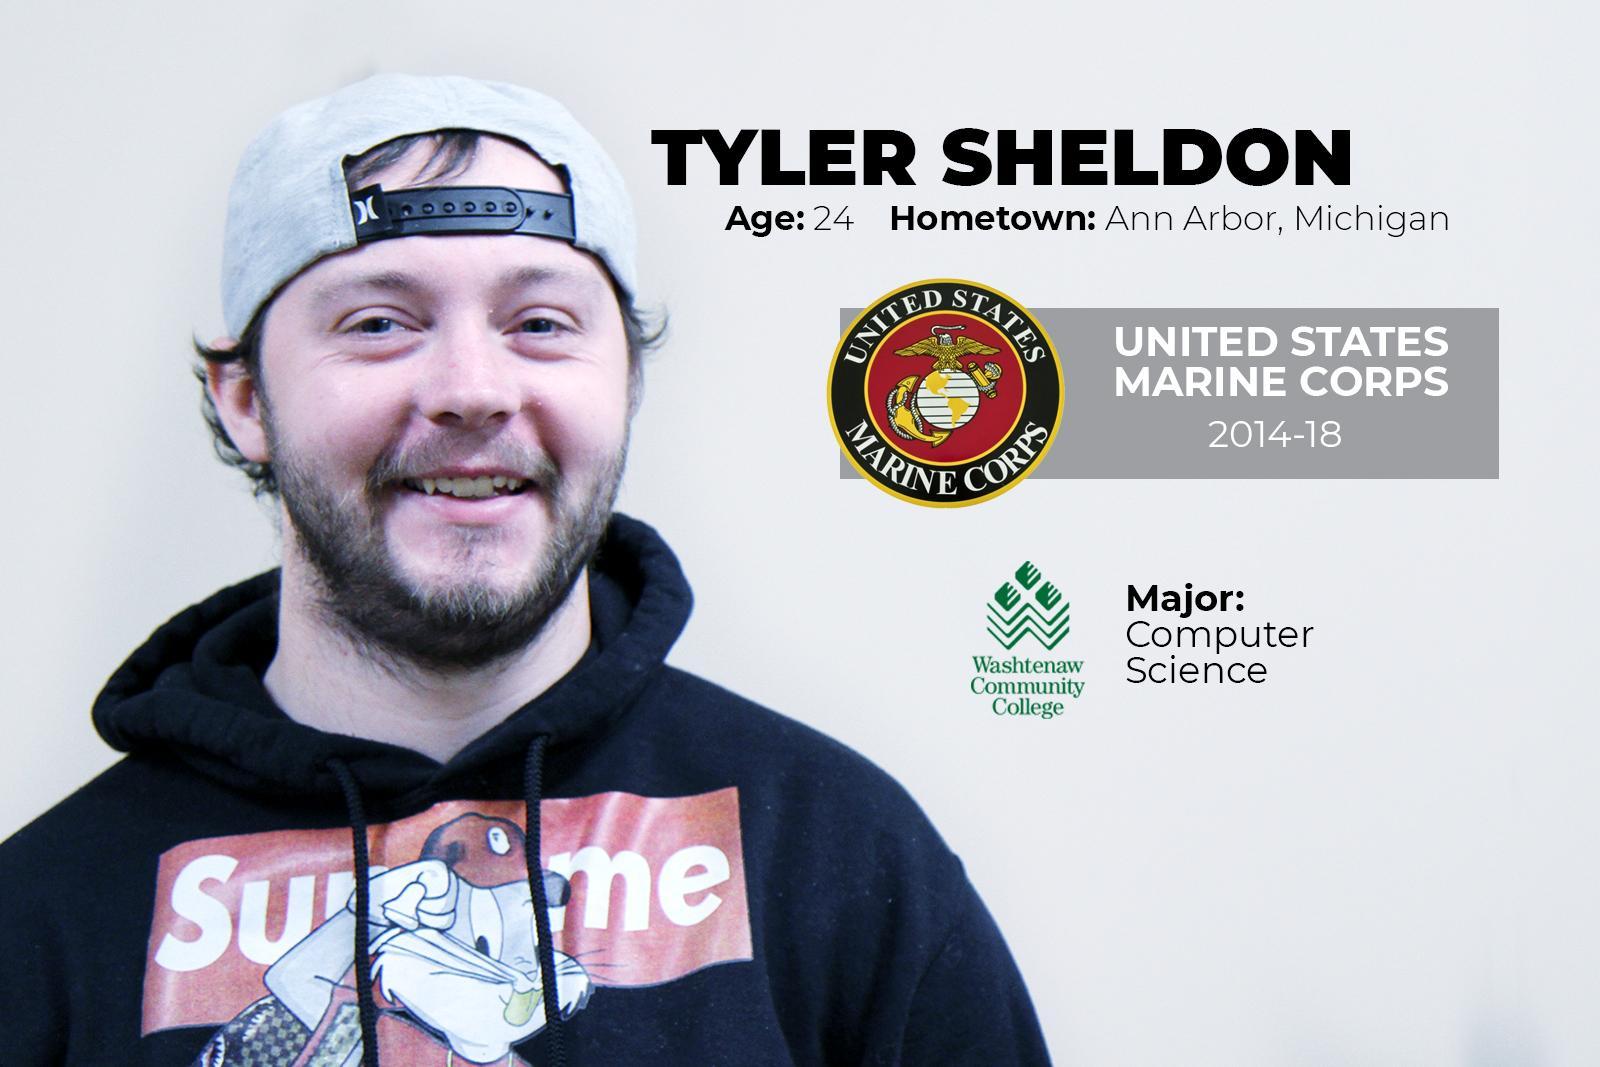 Tyler Sheldon